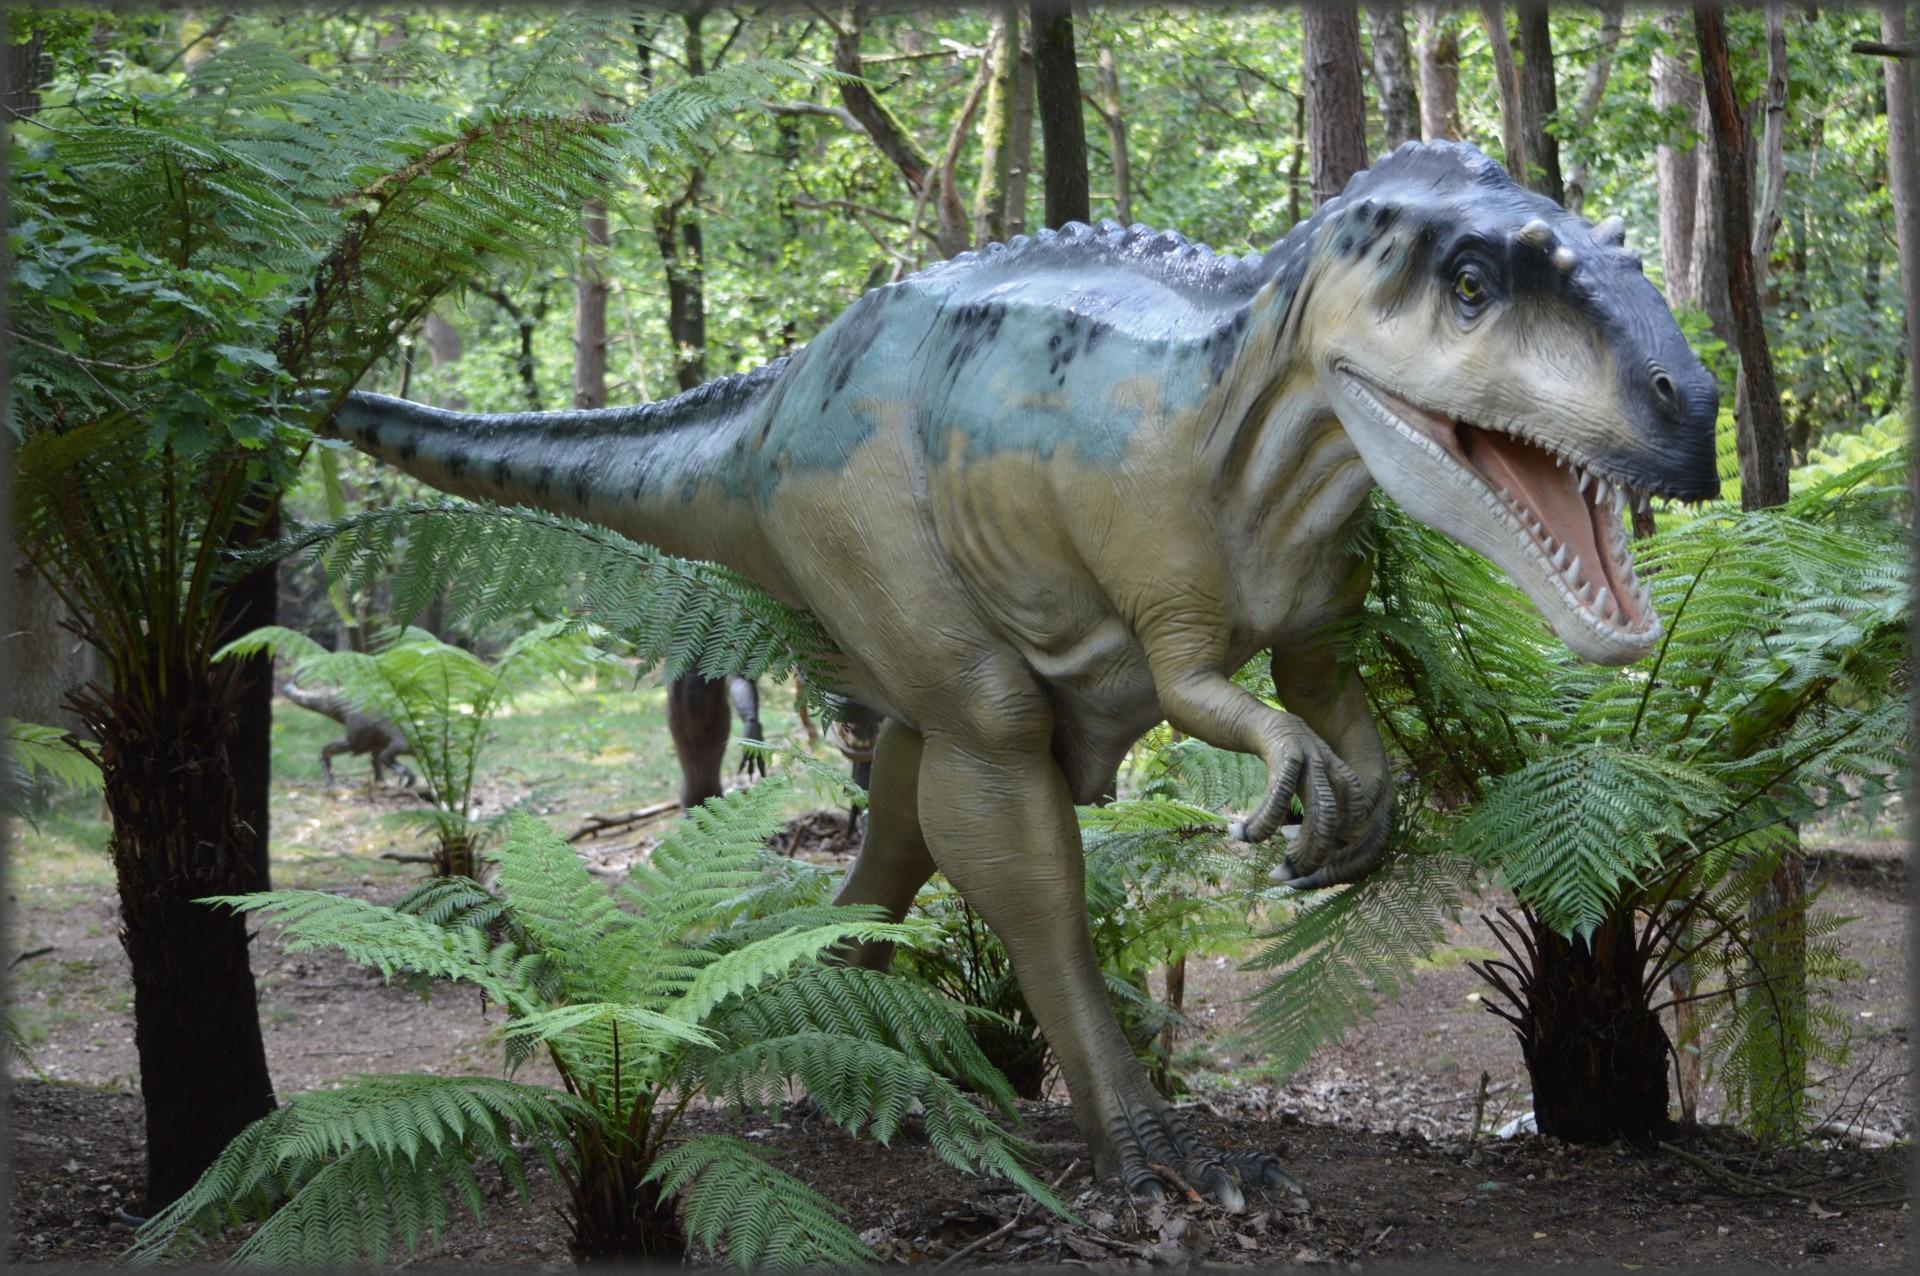 Free Images : animal, jungle, fauna, animals, extinction ... Extinct Species Dinosaurs